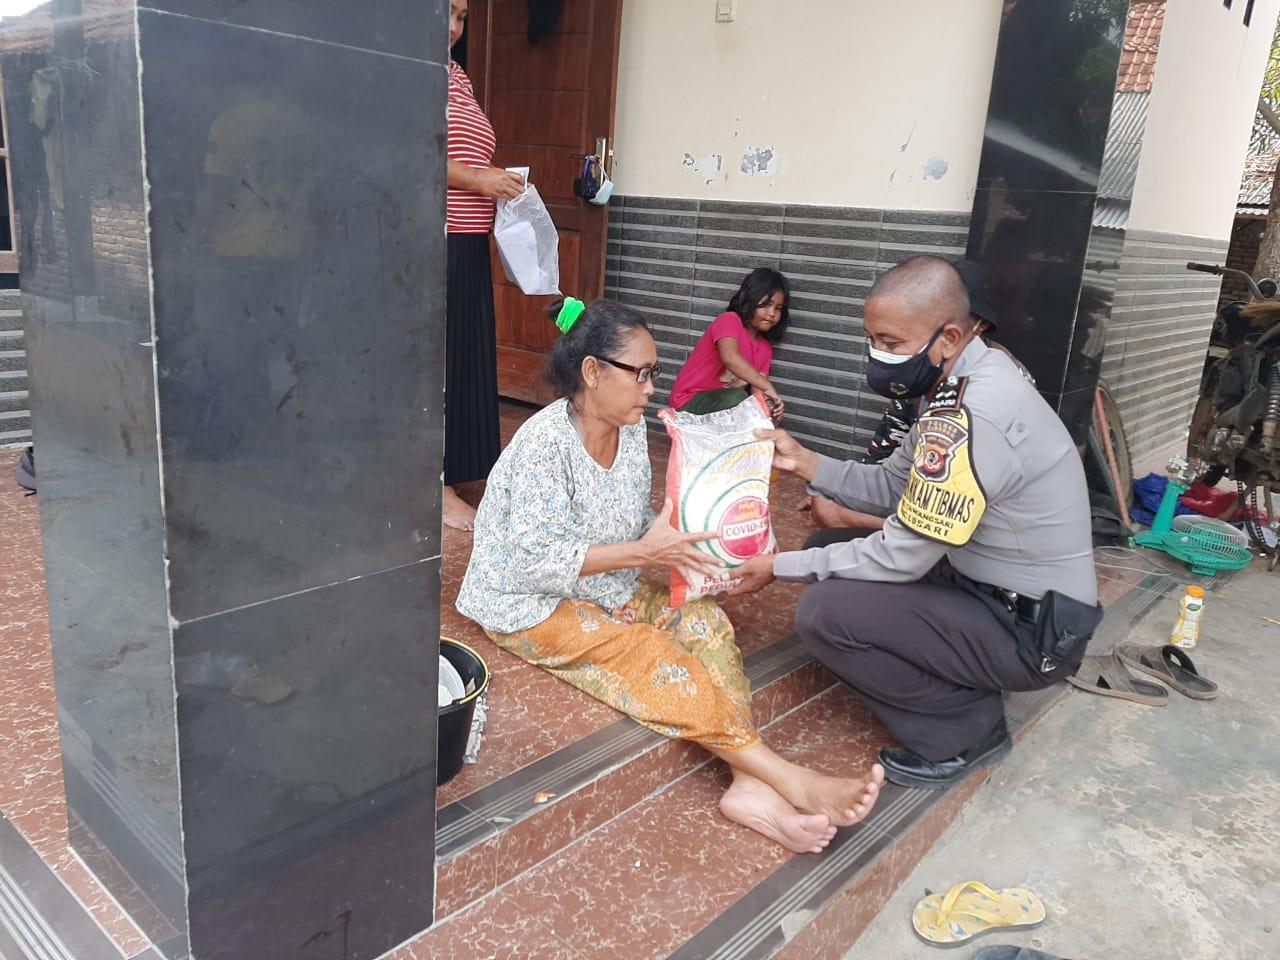 Peduli Covid-19, Polresta Cirebon Bagikan 200 Paket Sembako Kepada Warga Desa Bojong Gebang dan Desa Tawangsari